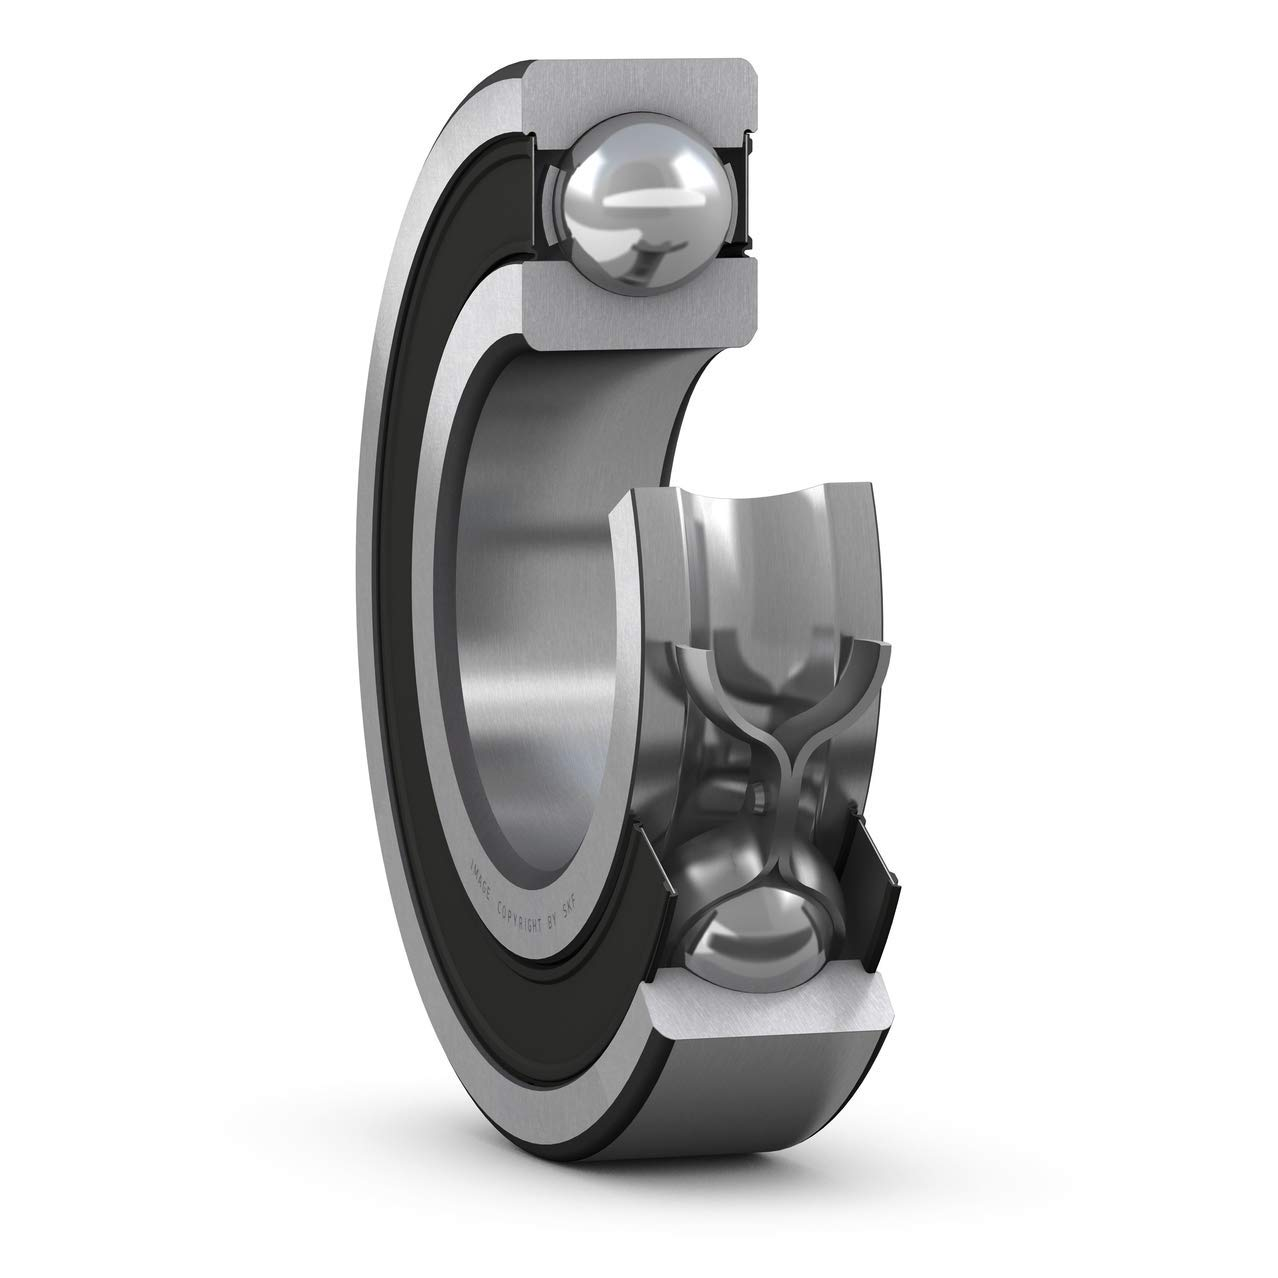 SKF - Rodamiento radial de ranura profunda, 3 ID, acero inoxidable